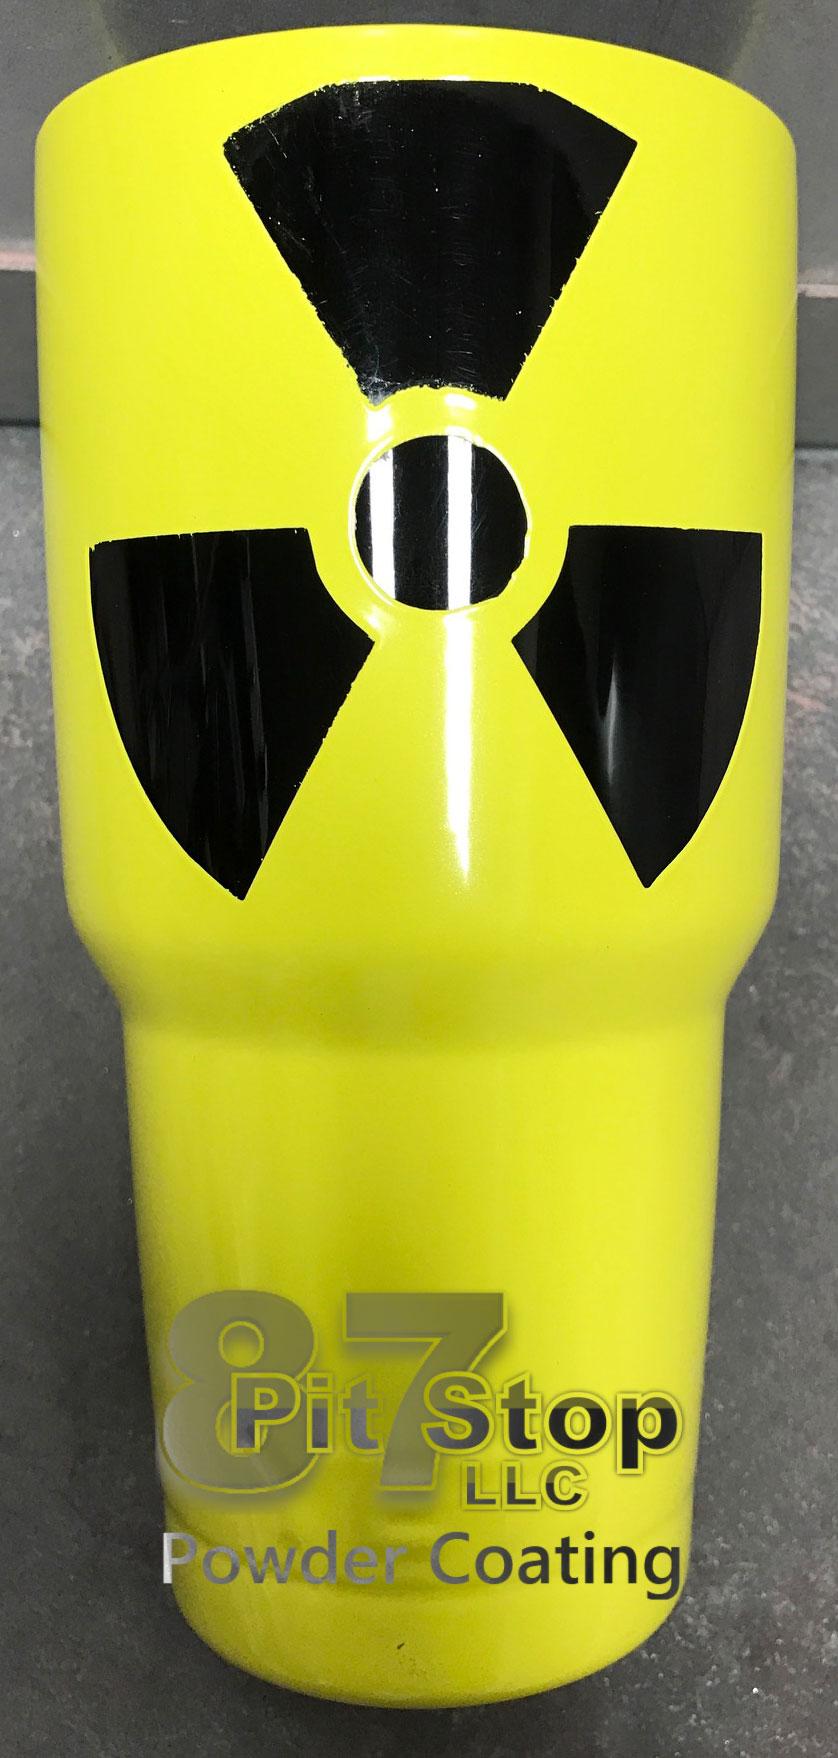 radioactivecup.jpg